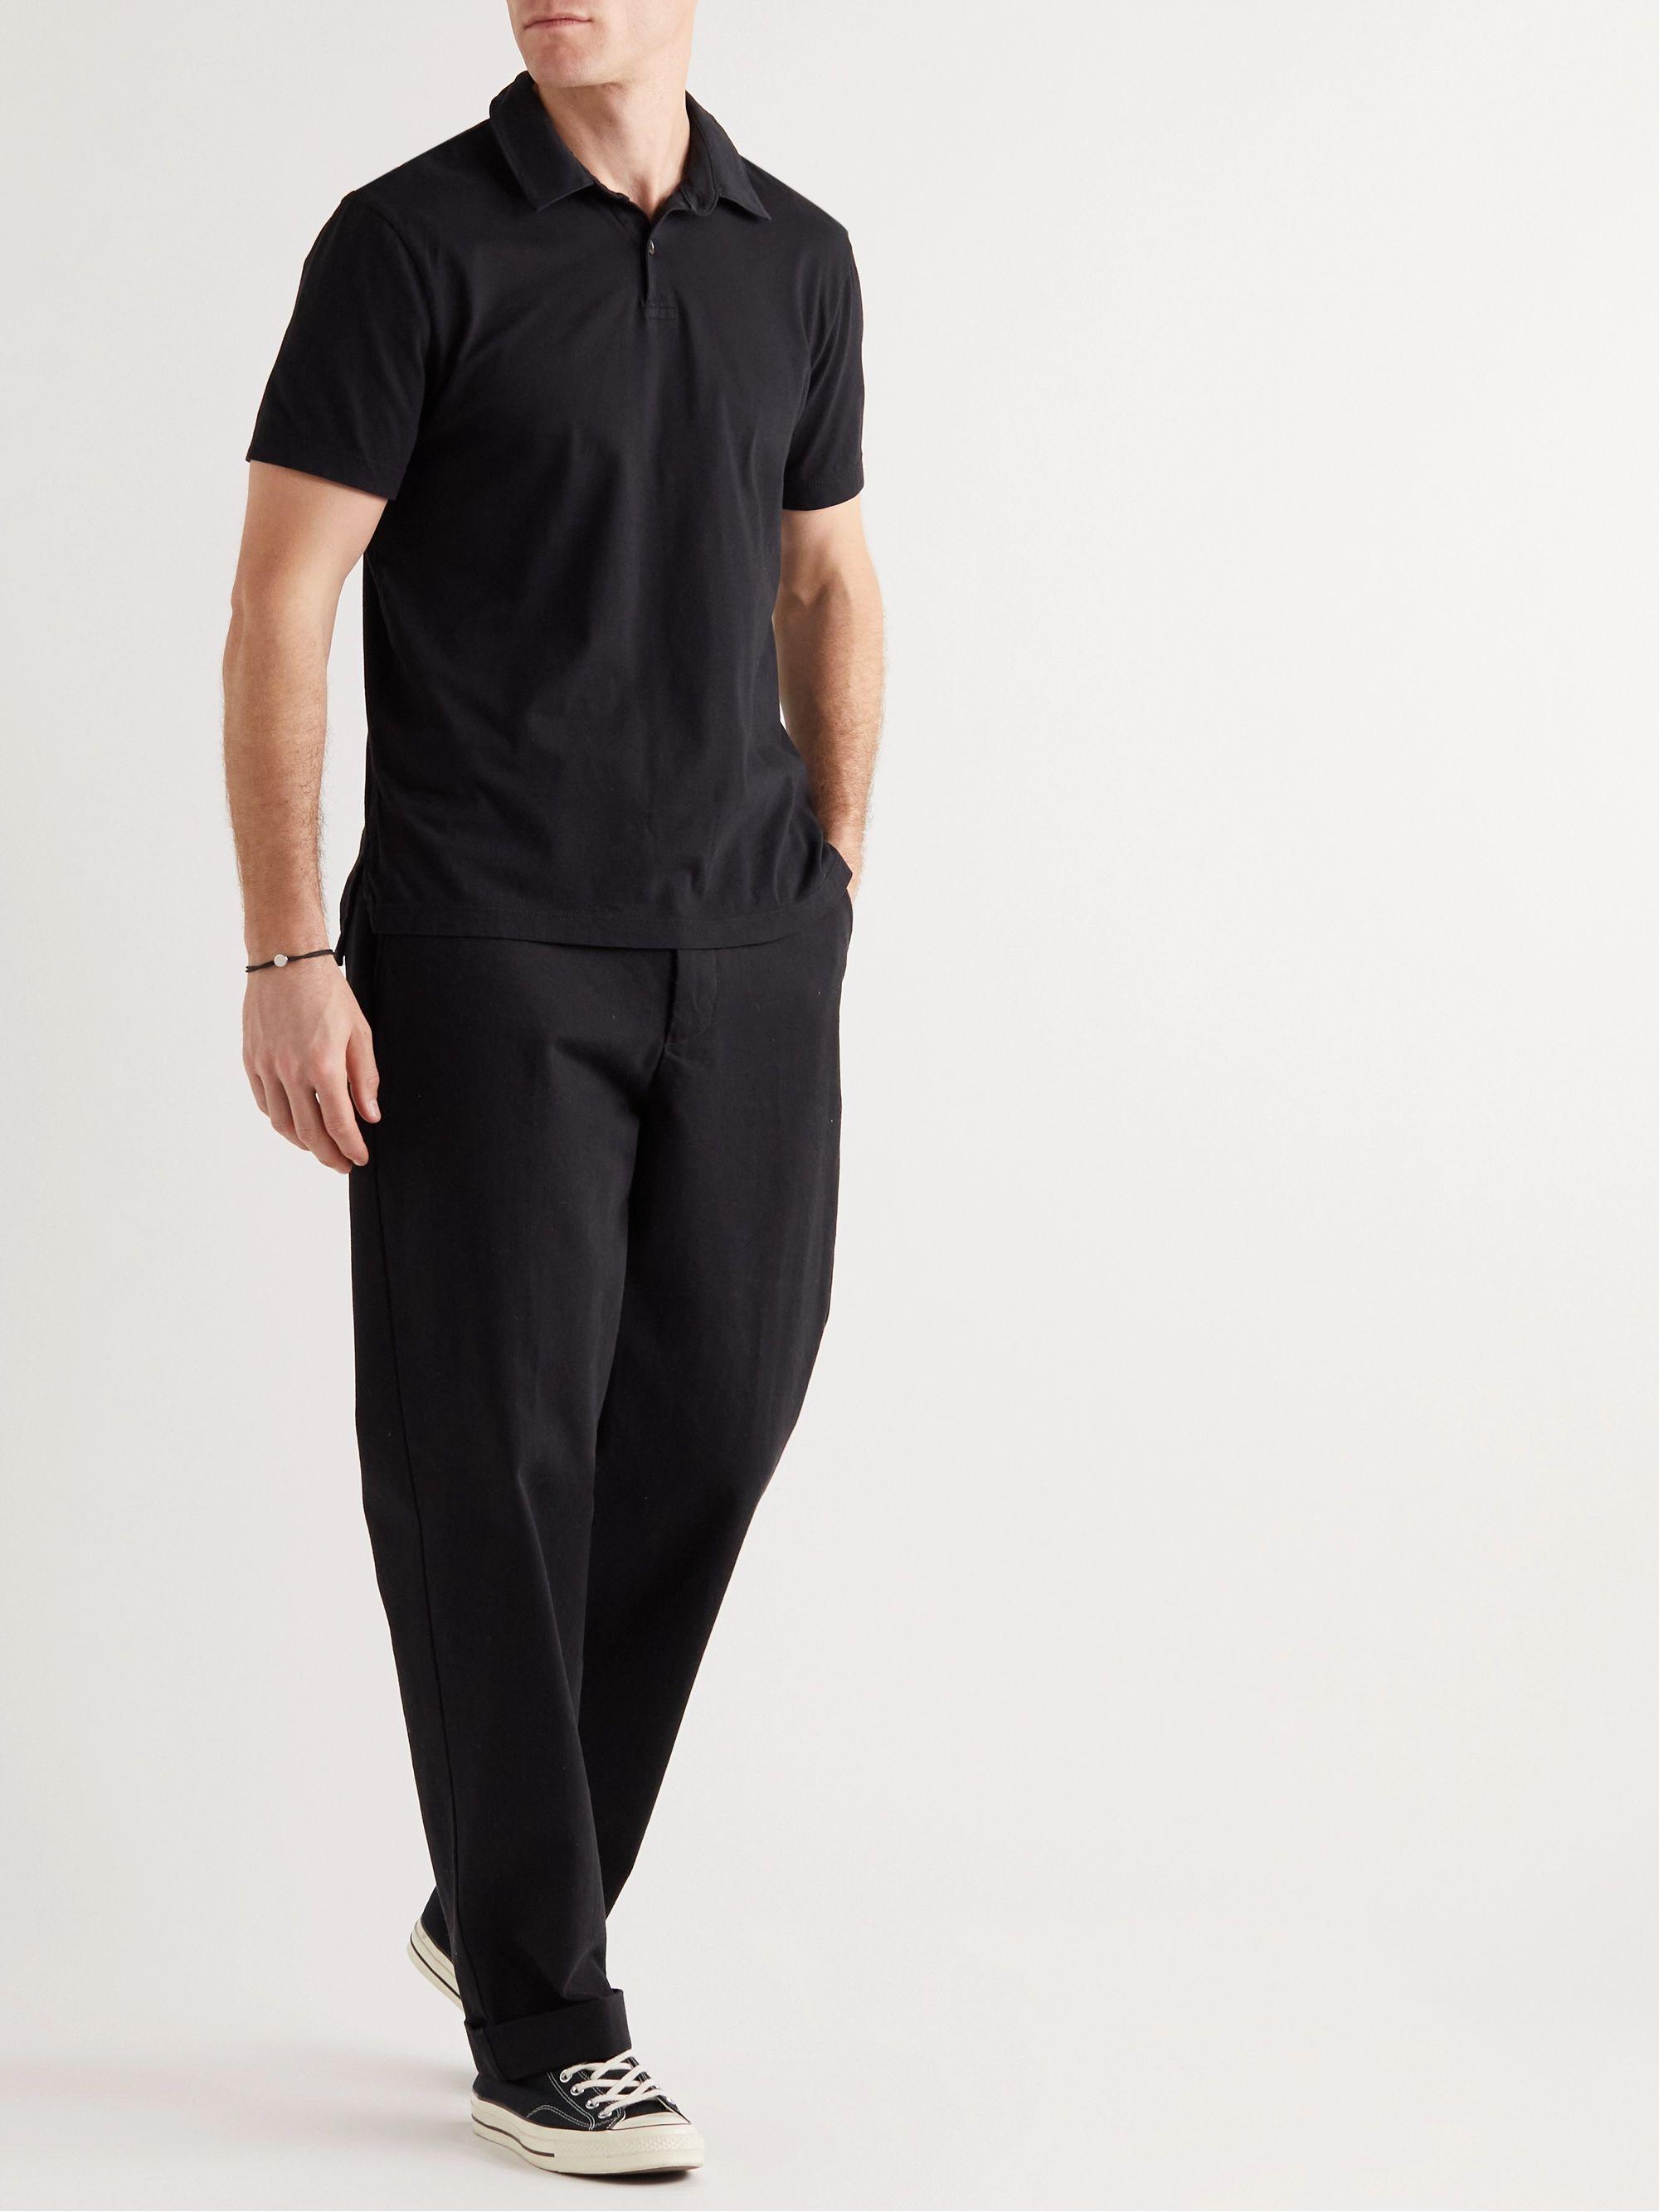 Black Slim-fit Supima Cotton-jersey Polo Shirt | James Perse